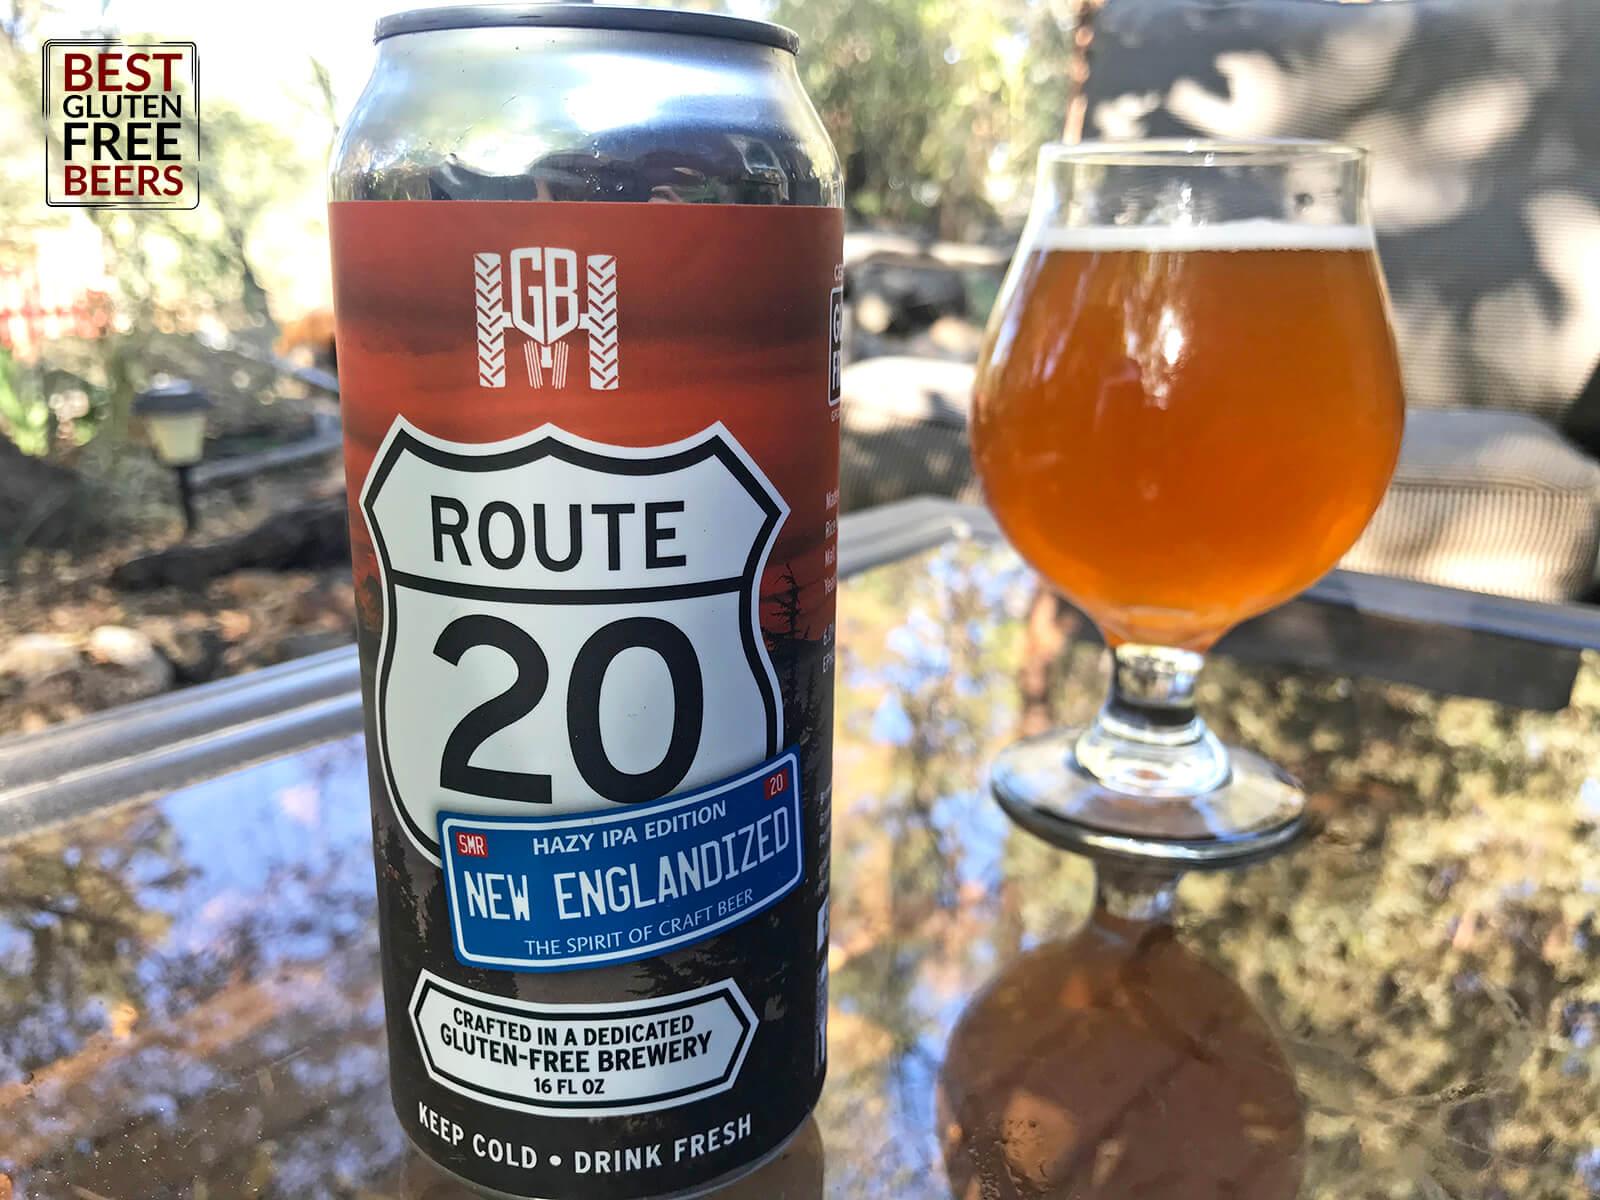 Ground Breaker Route 20 New Englandized Hazy IPA 2020